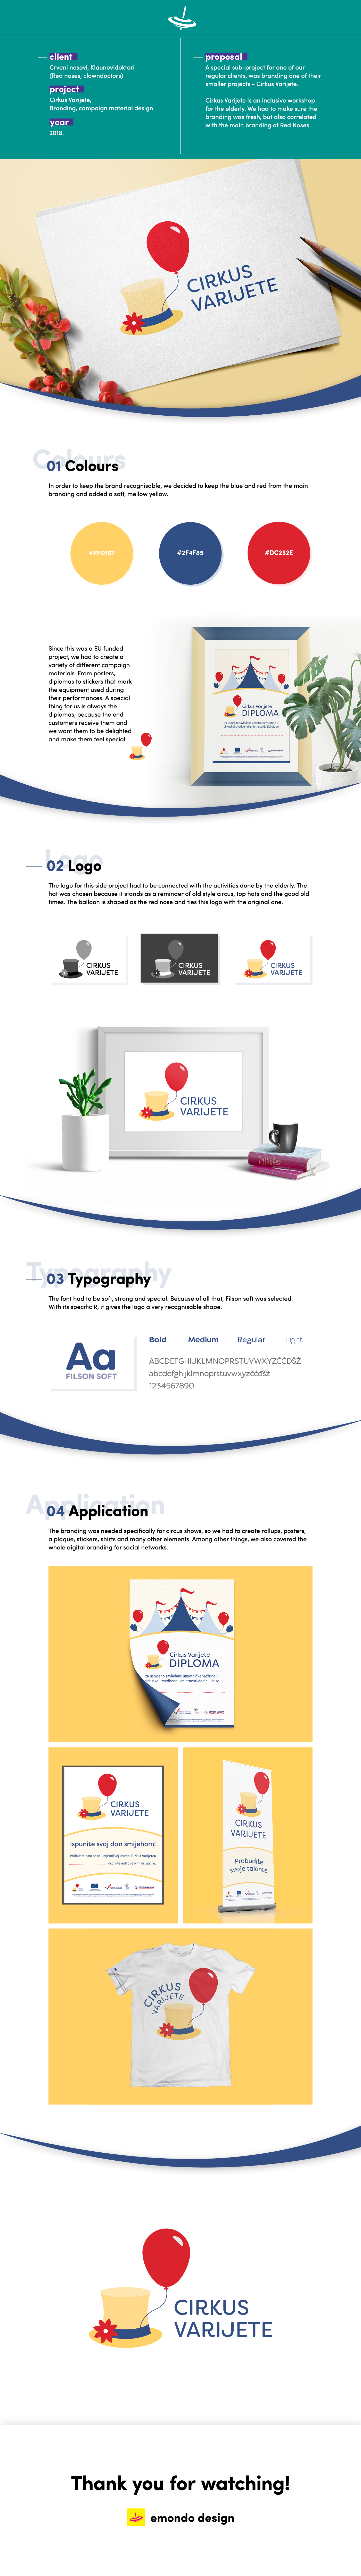 design branding  graphic design  logo posters EU project visual identity emondo design diploma Roll-Up